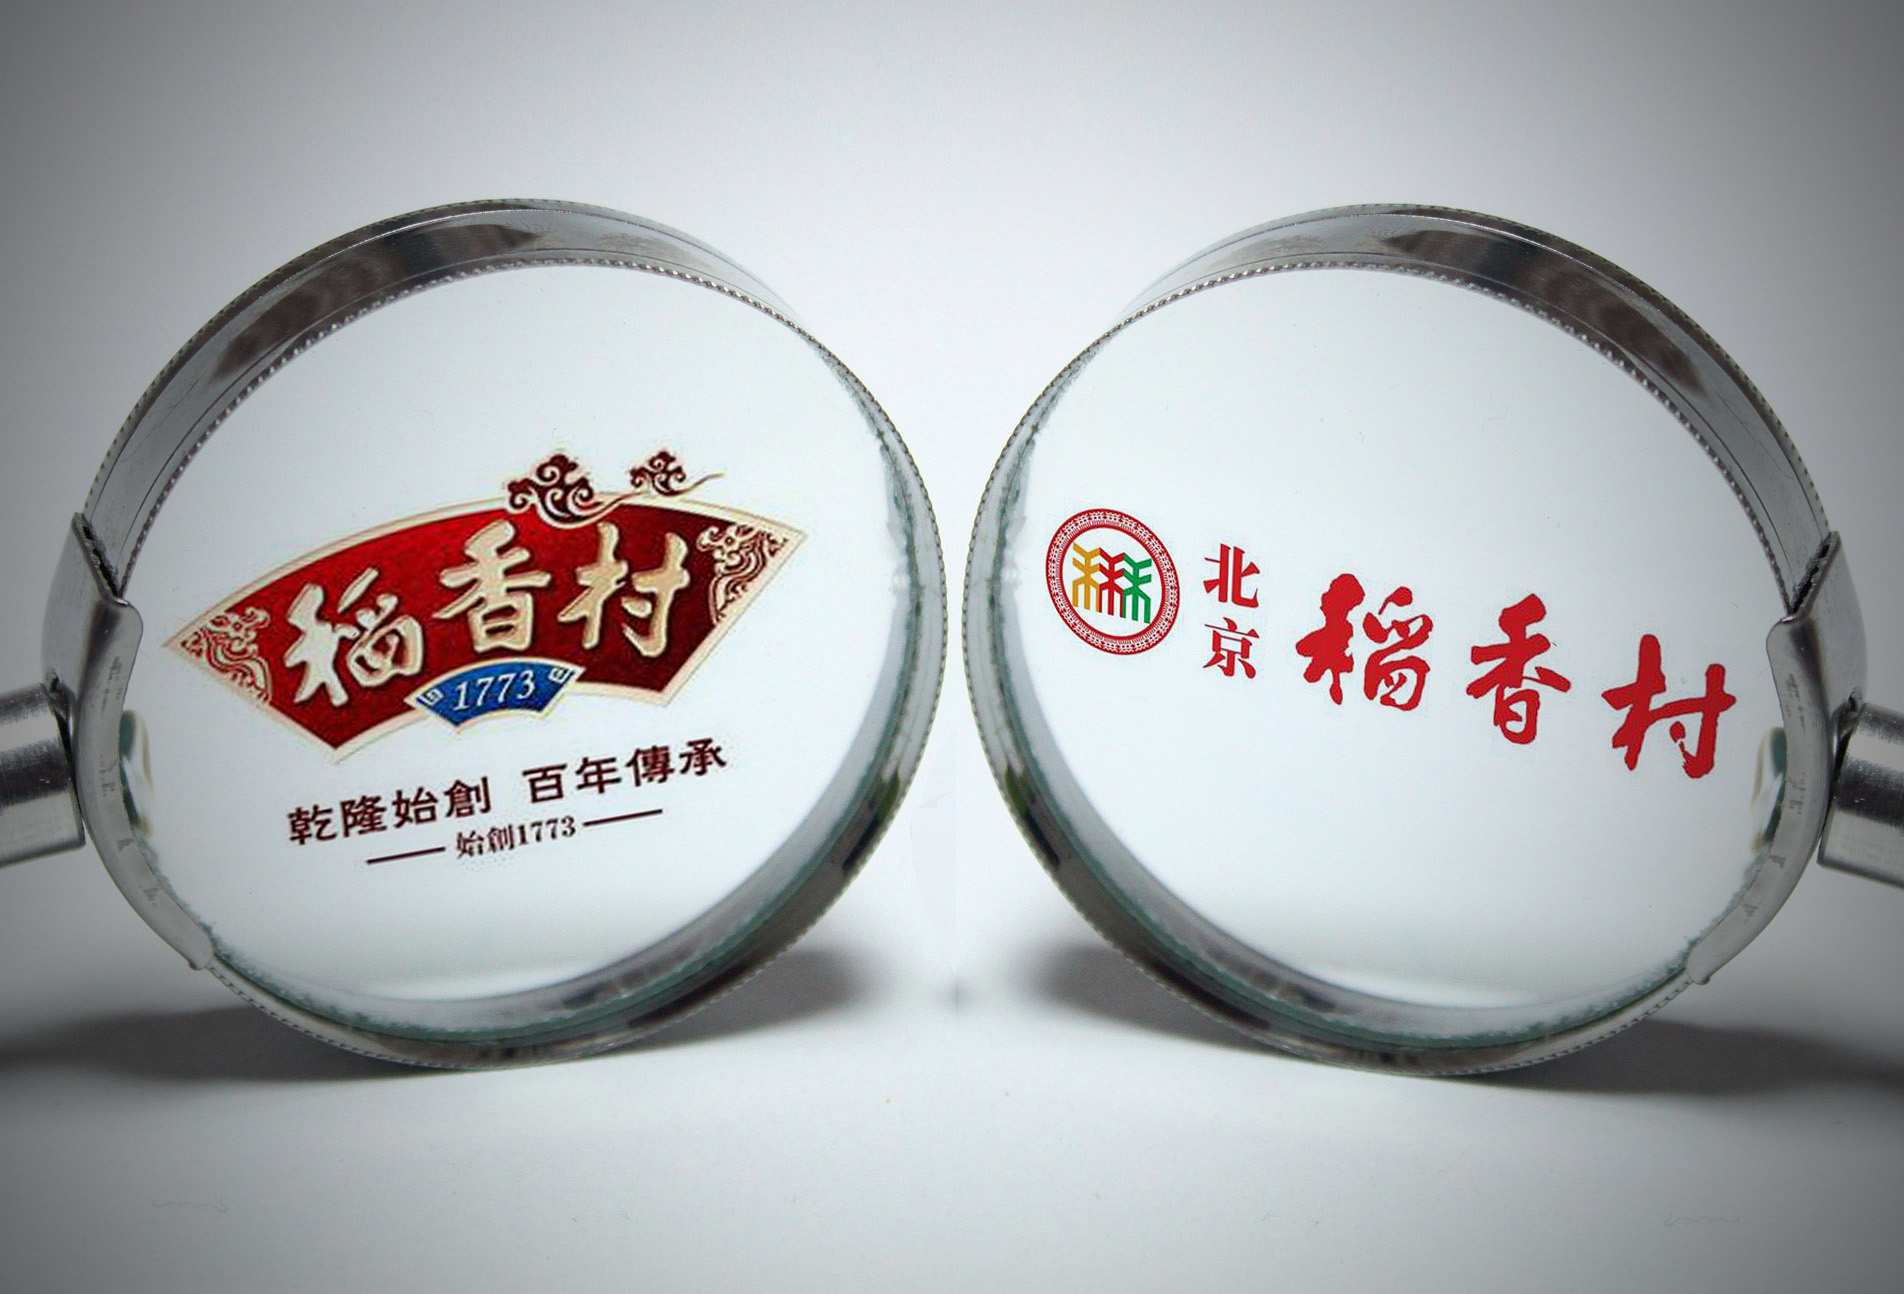 The brand logos of Suzhou Daoxiangcun (left) and Beijing Daoxiangcun (right). VCG